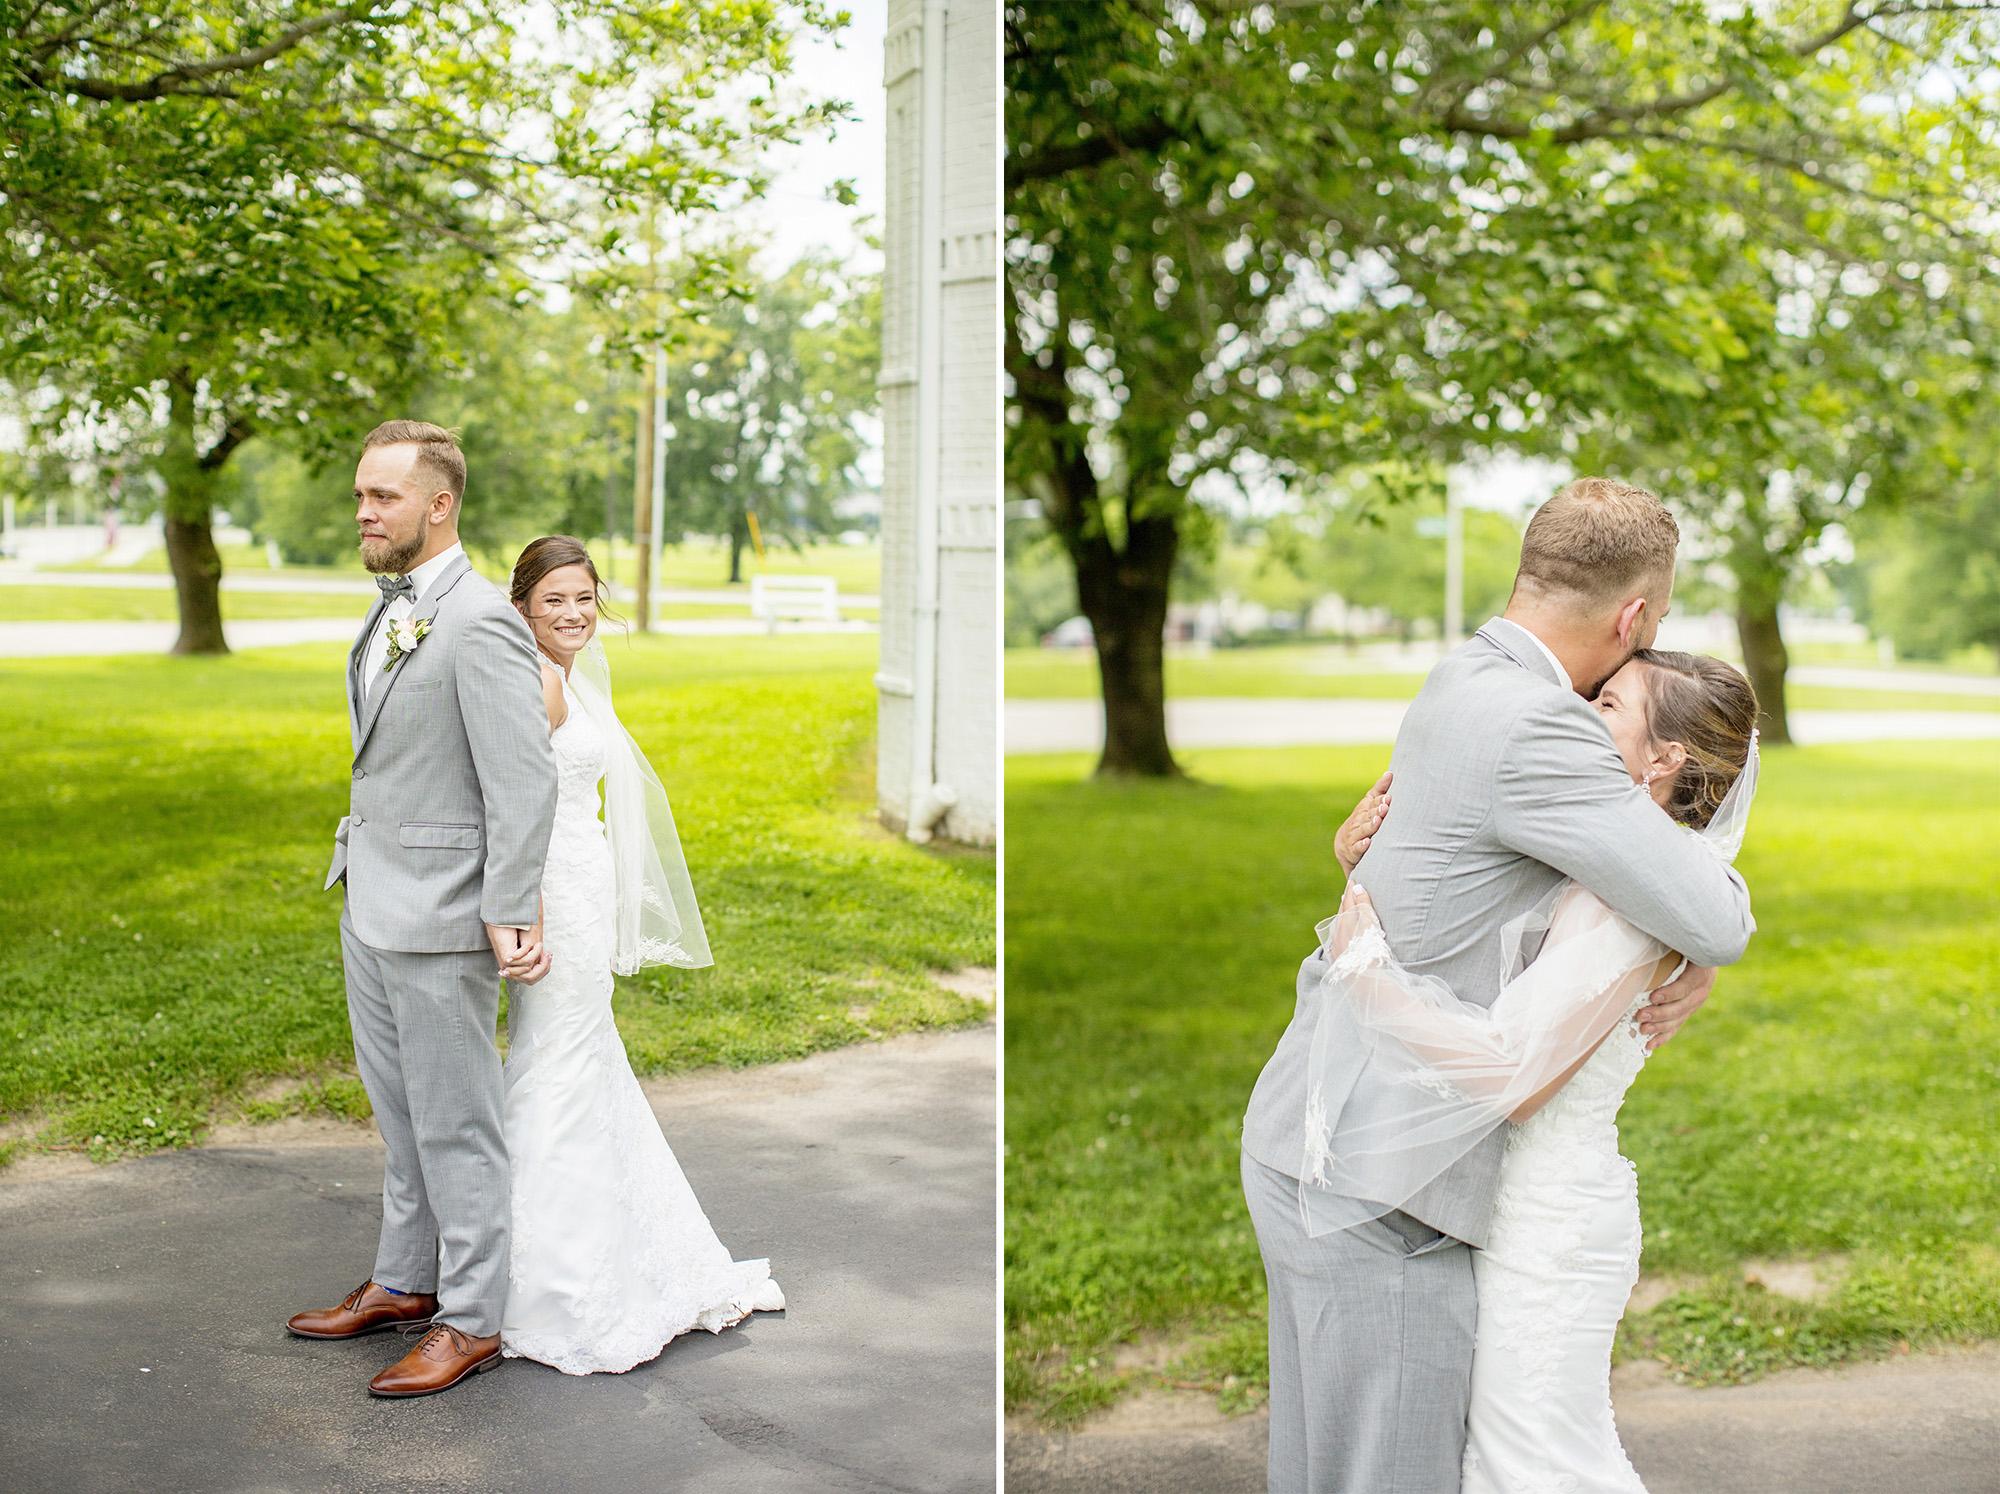 Seriously_Sabrina_Photography_Lexington_Kentucky_Round_Barn_Red_Mile_Stable_of_Memories_Wedding_Hart_37.jpg